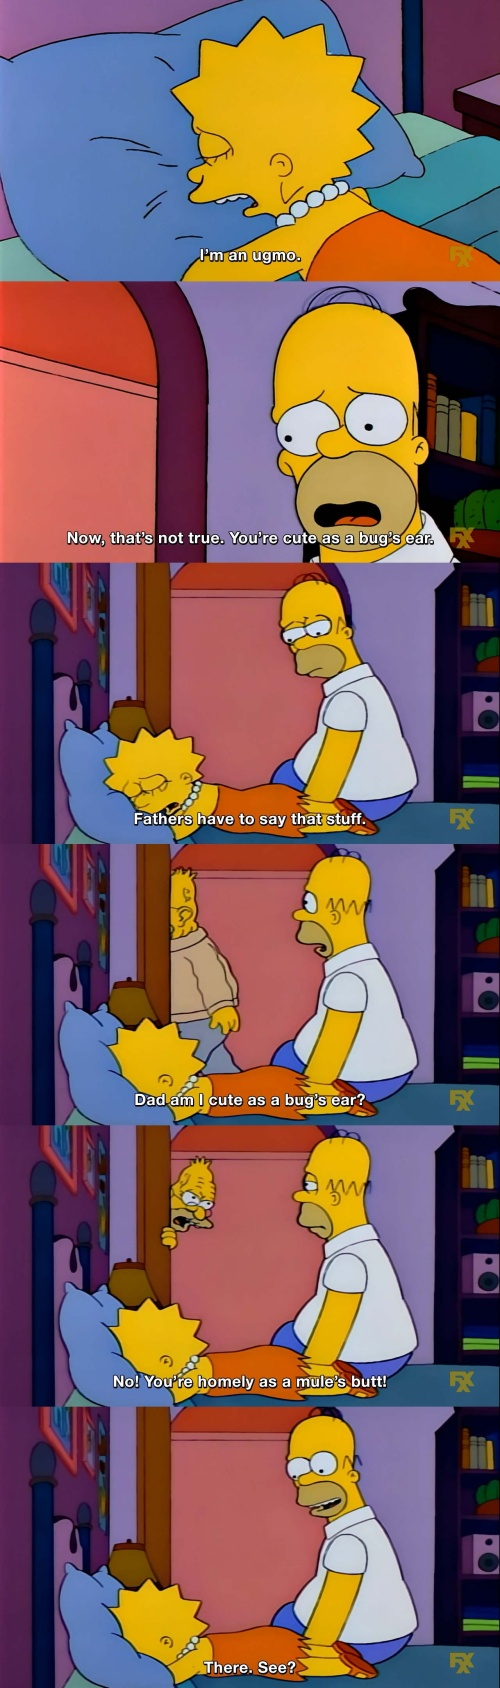 The Simpsons - I'm an ugmo